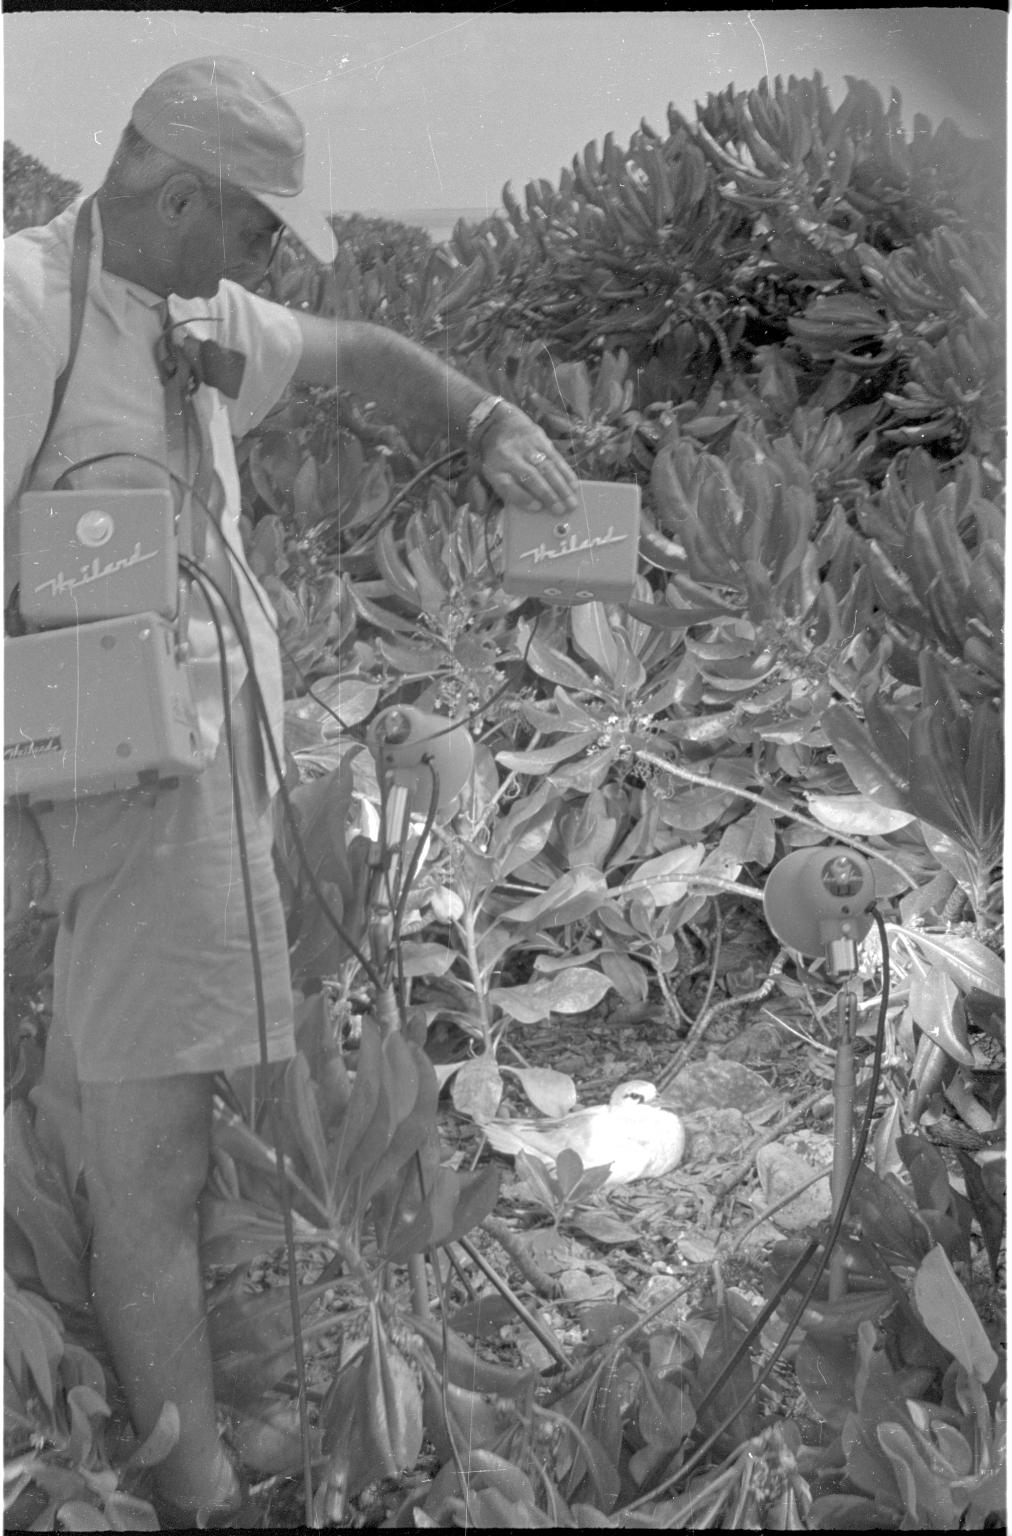 Fieldwork in Kiribati